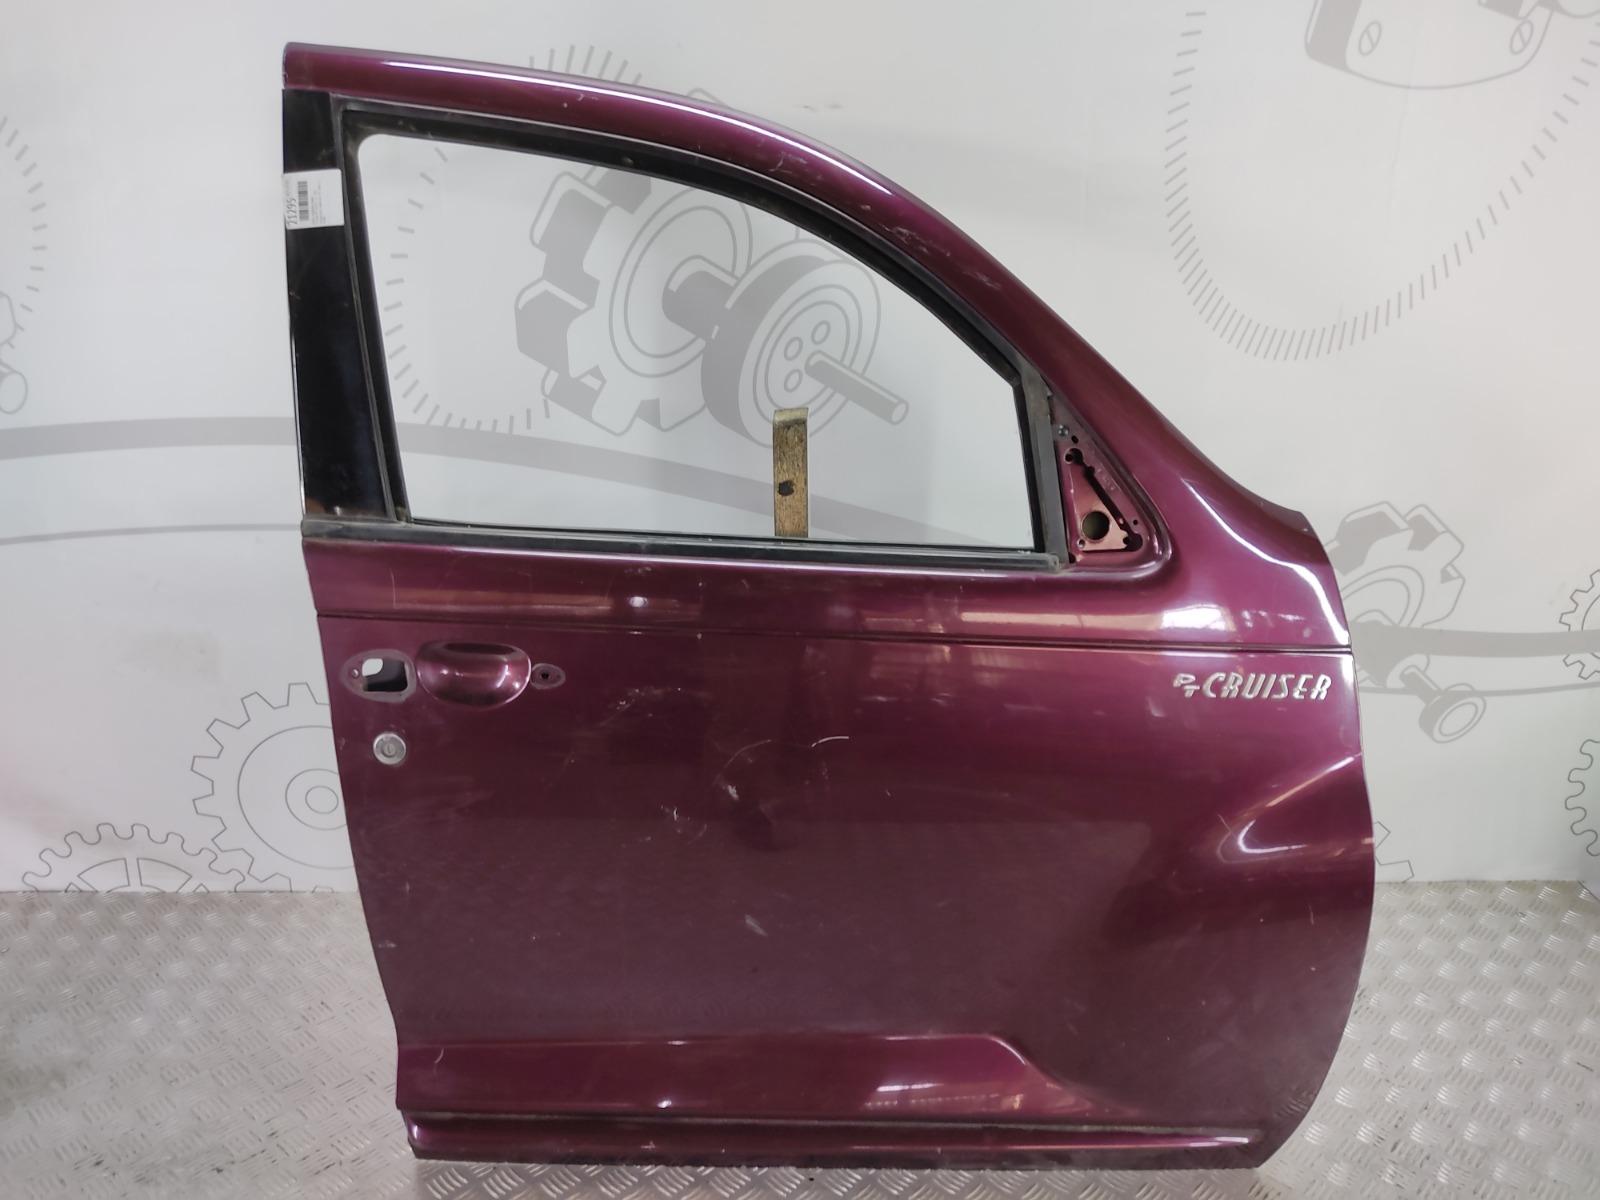 Дверь передняя правая Chrysler Pt-Cruiser 2.0 I 2003 (б/у)